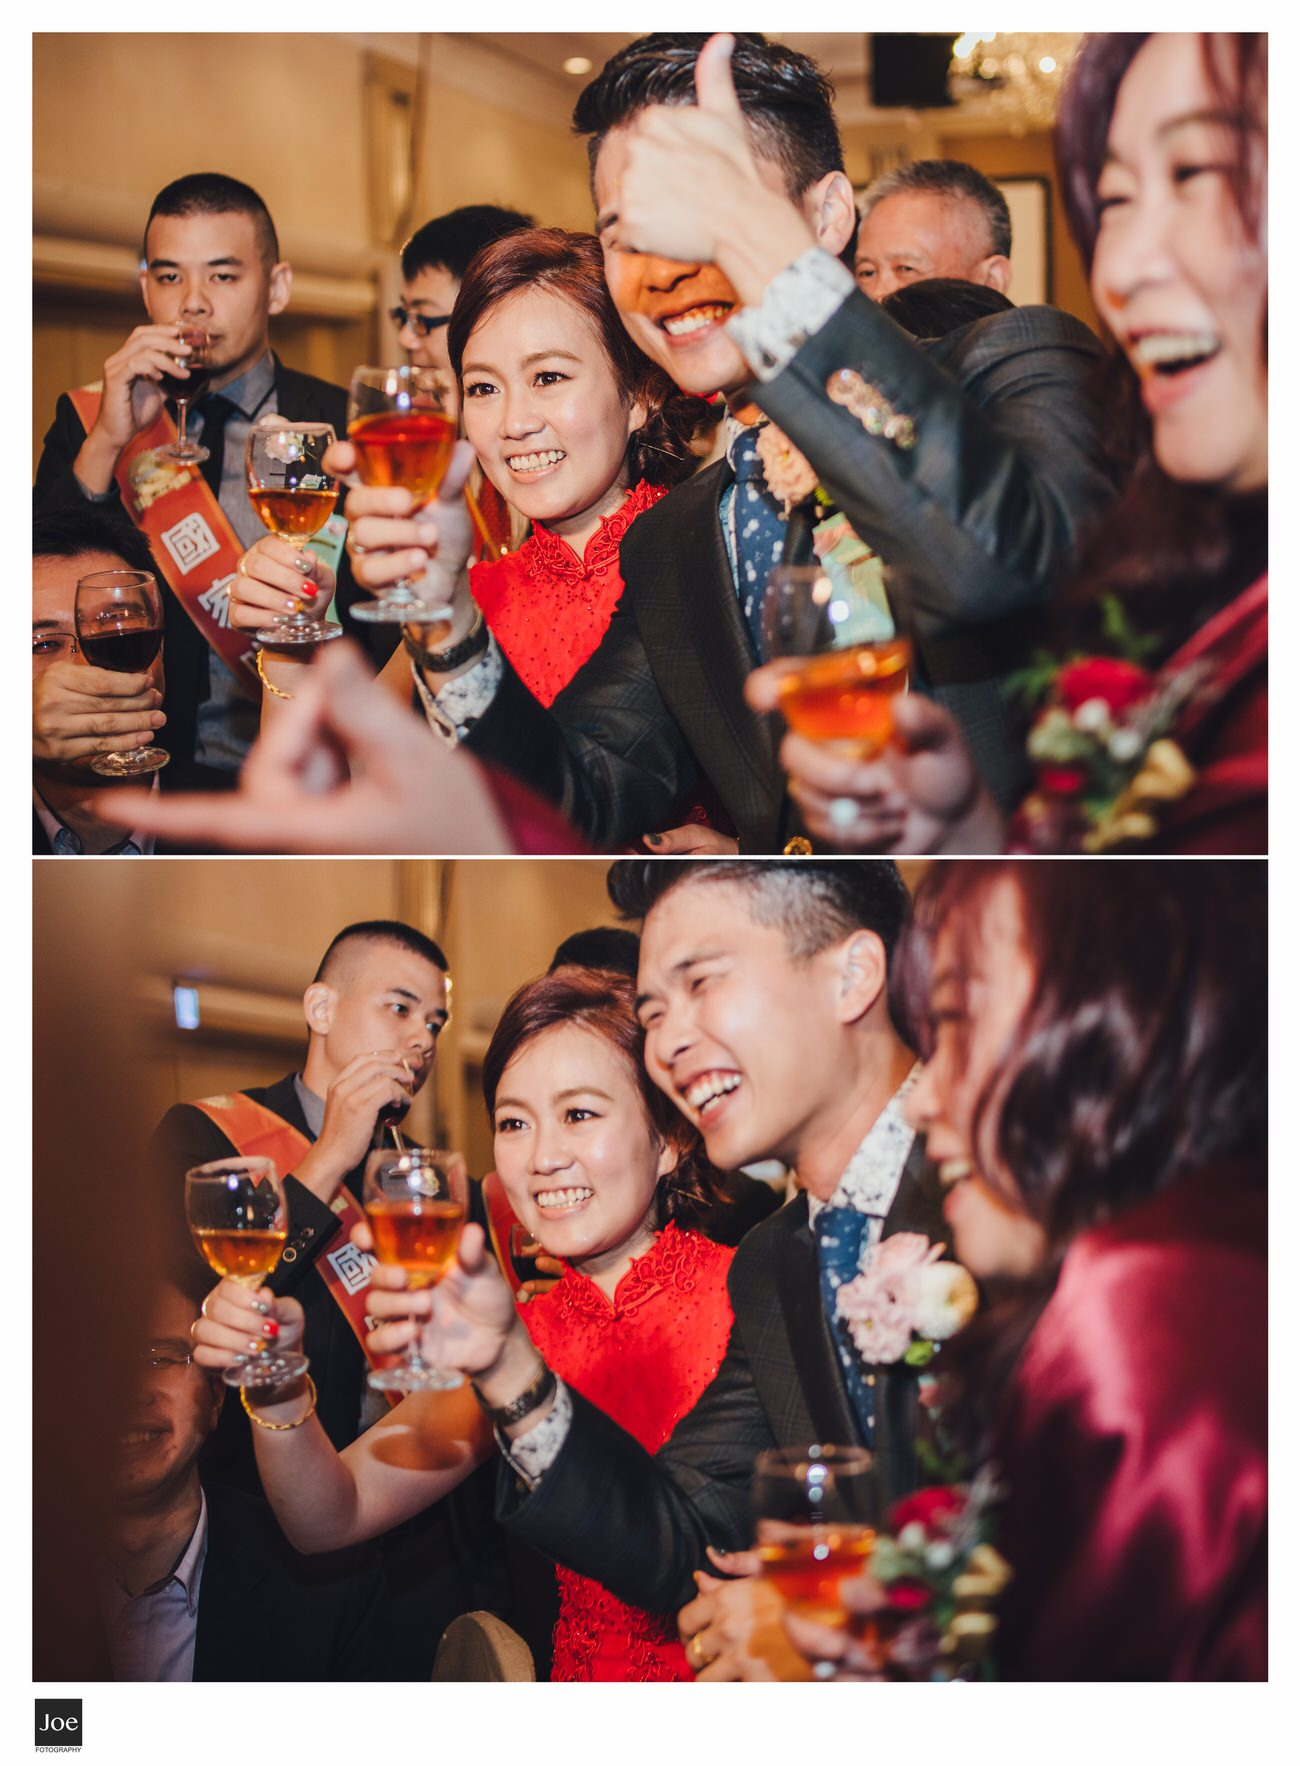 sunworld-dynasty-hotel-taipei-wedding-photo-joe-fotography-angel-jay-111.jpg